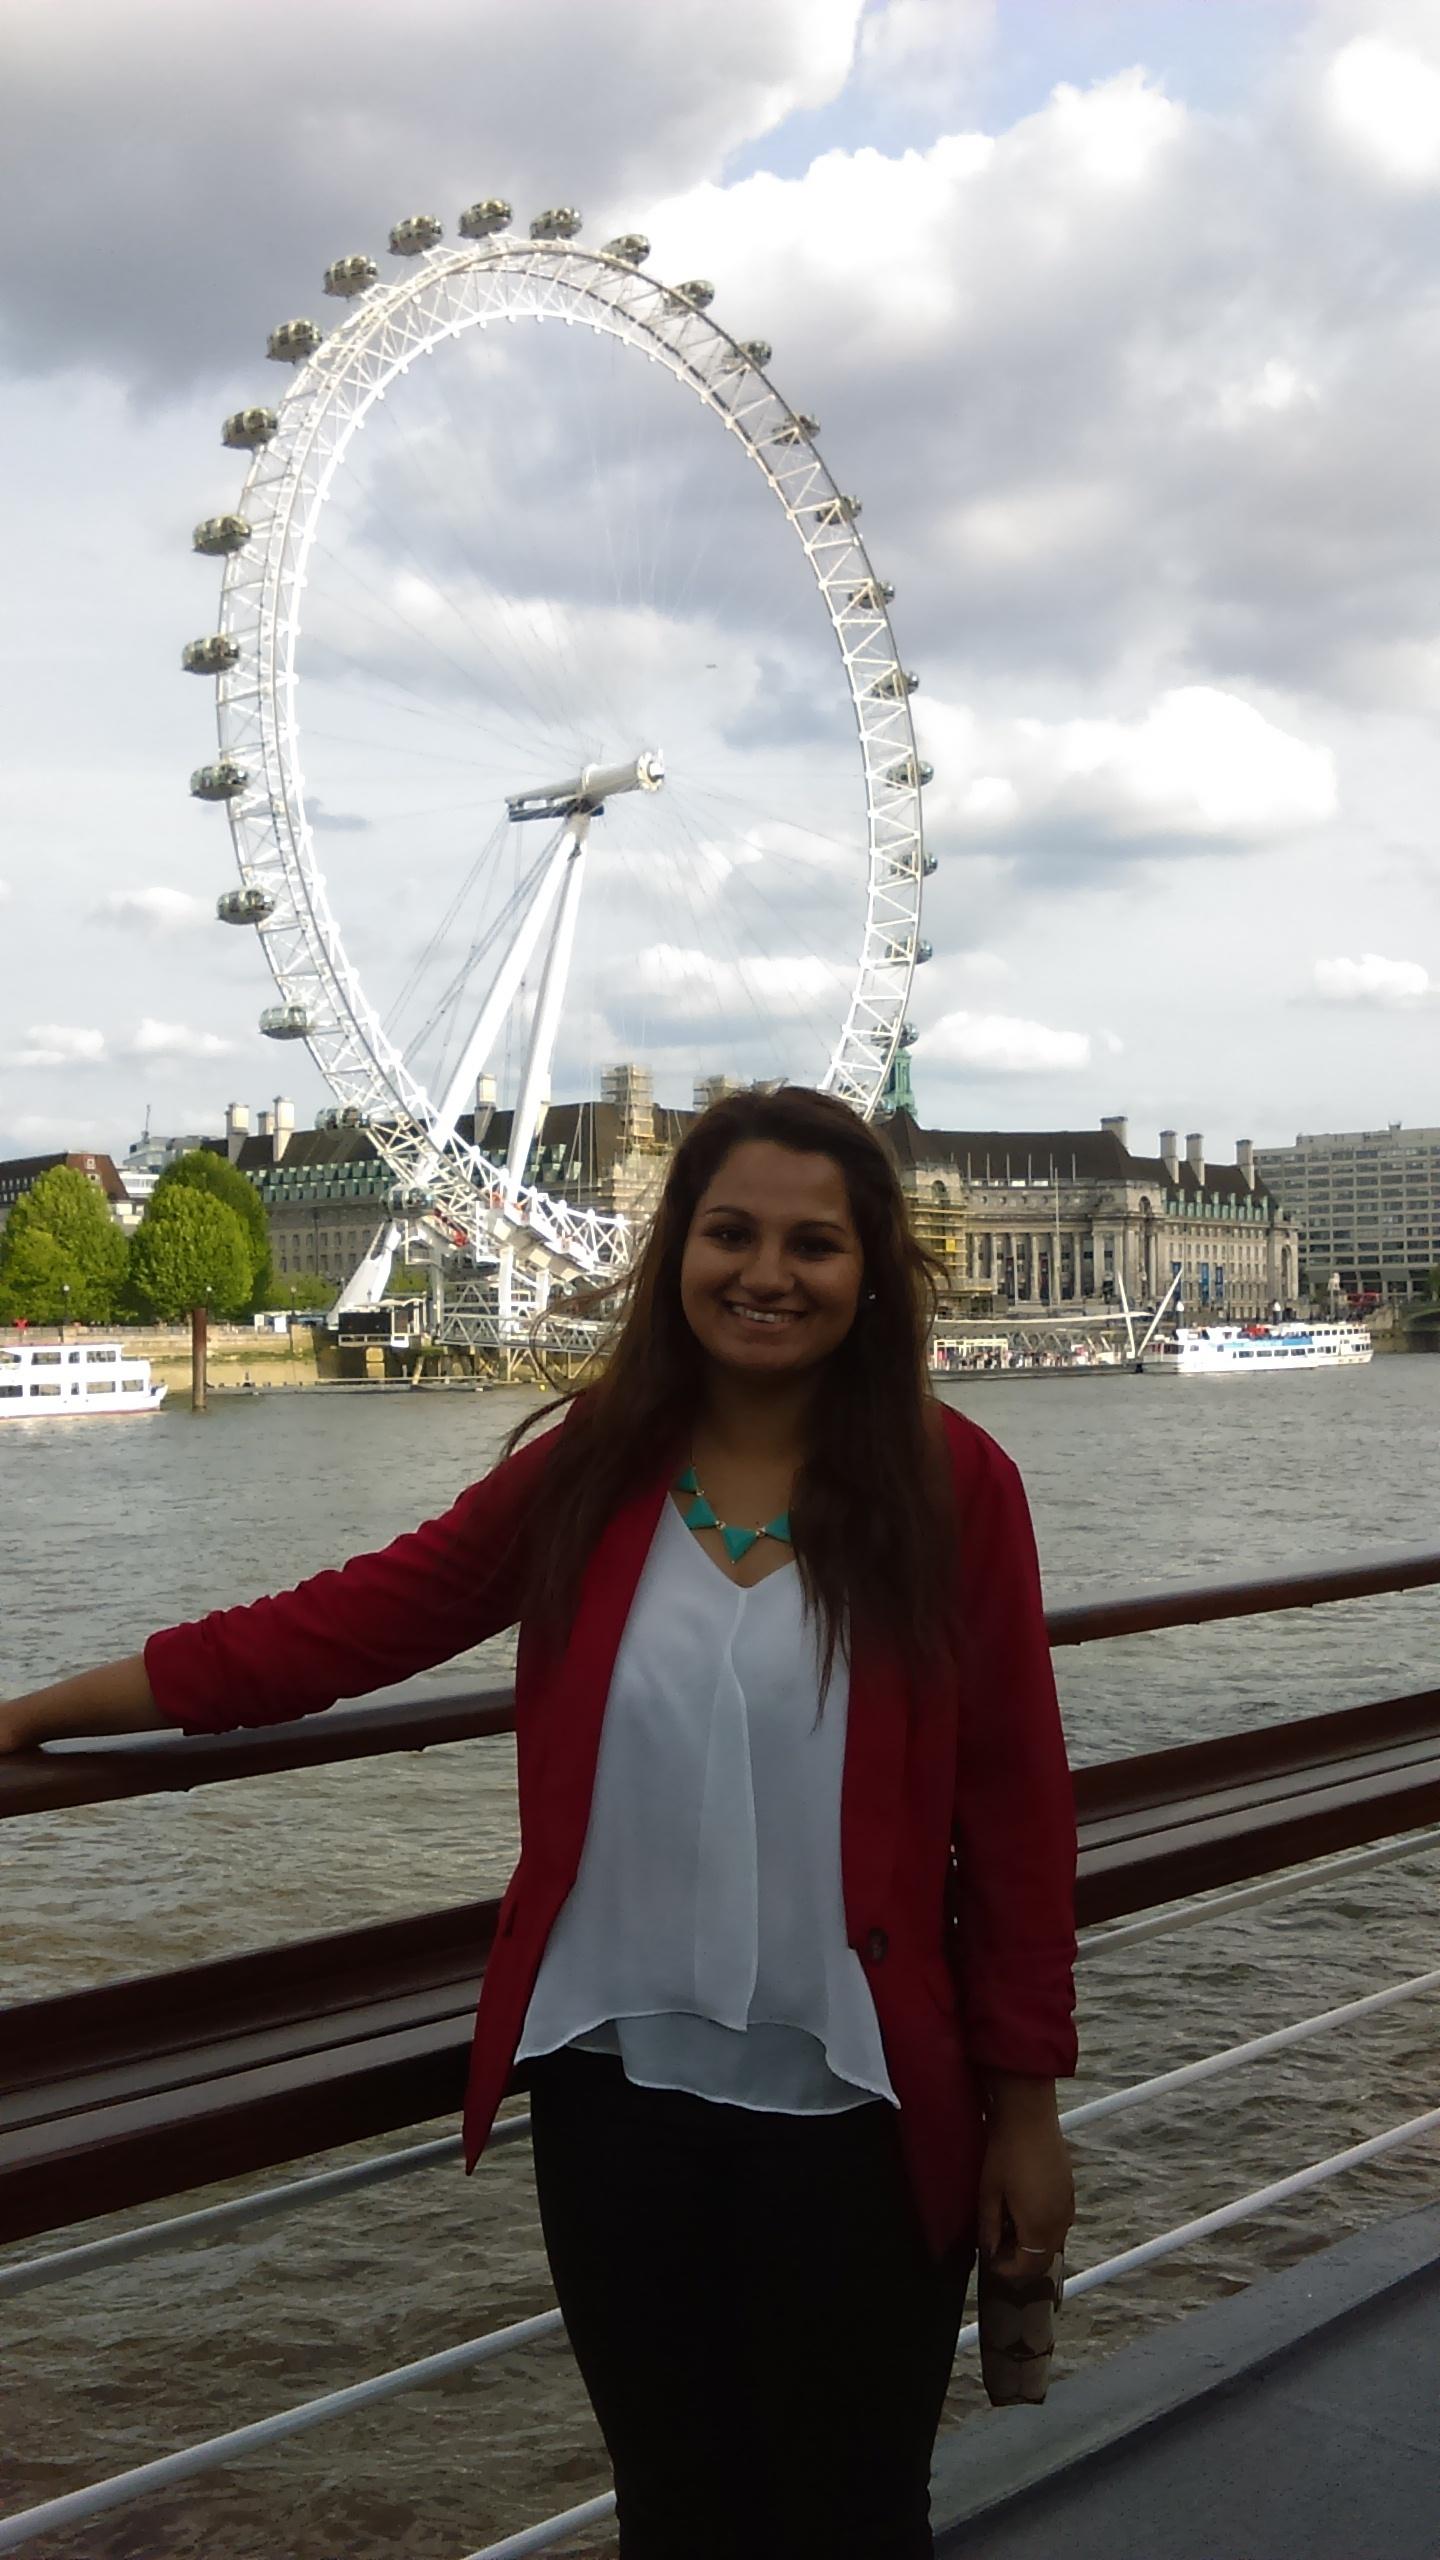 CAPAStudyAbroad_London_Summer2015_From_Roshni_Patel_-_London_Eye